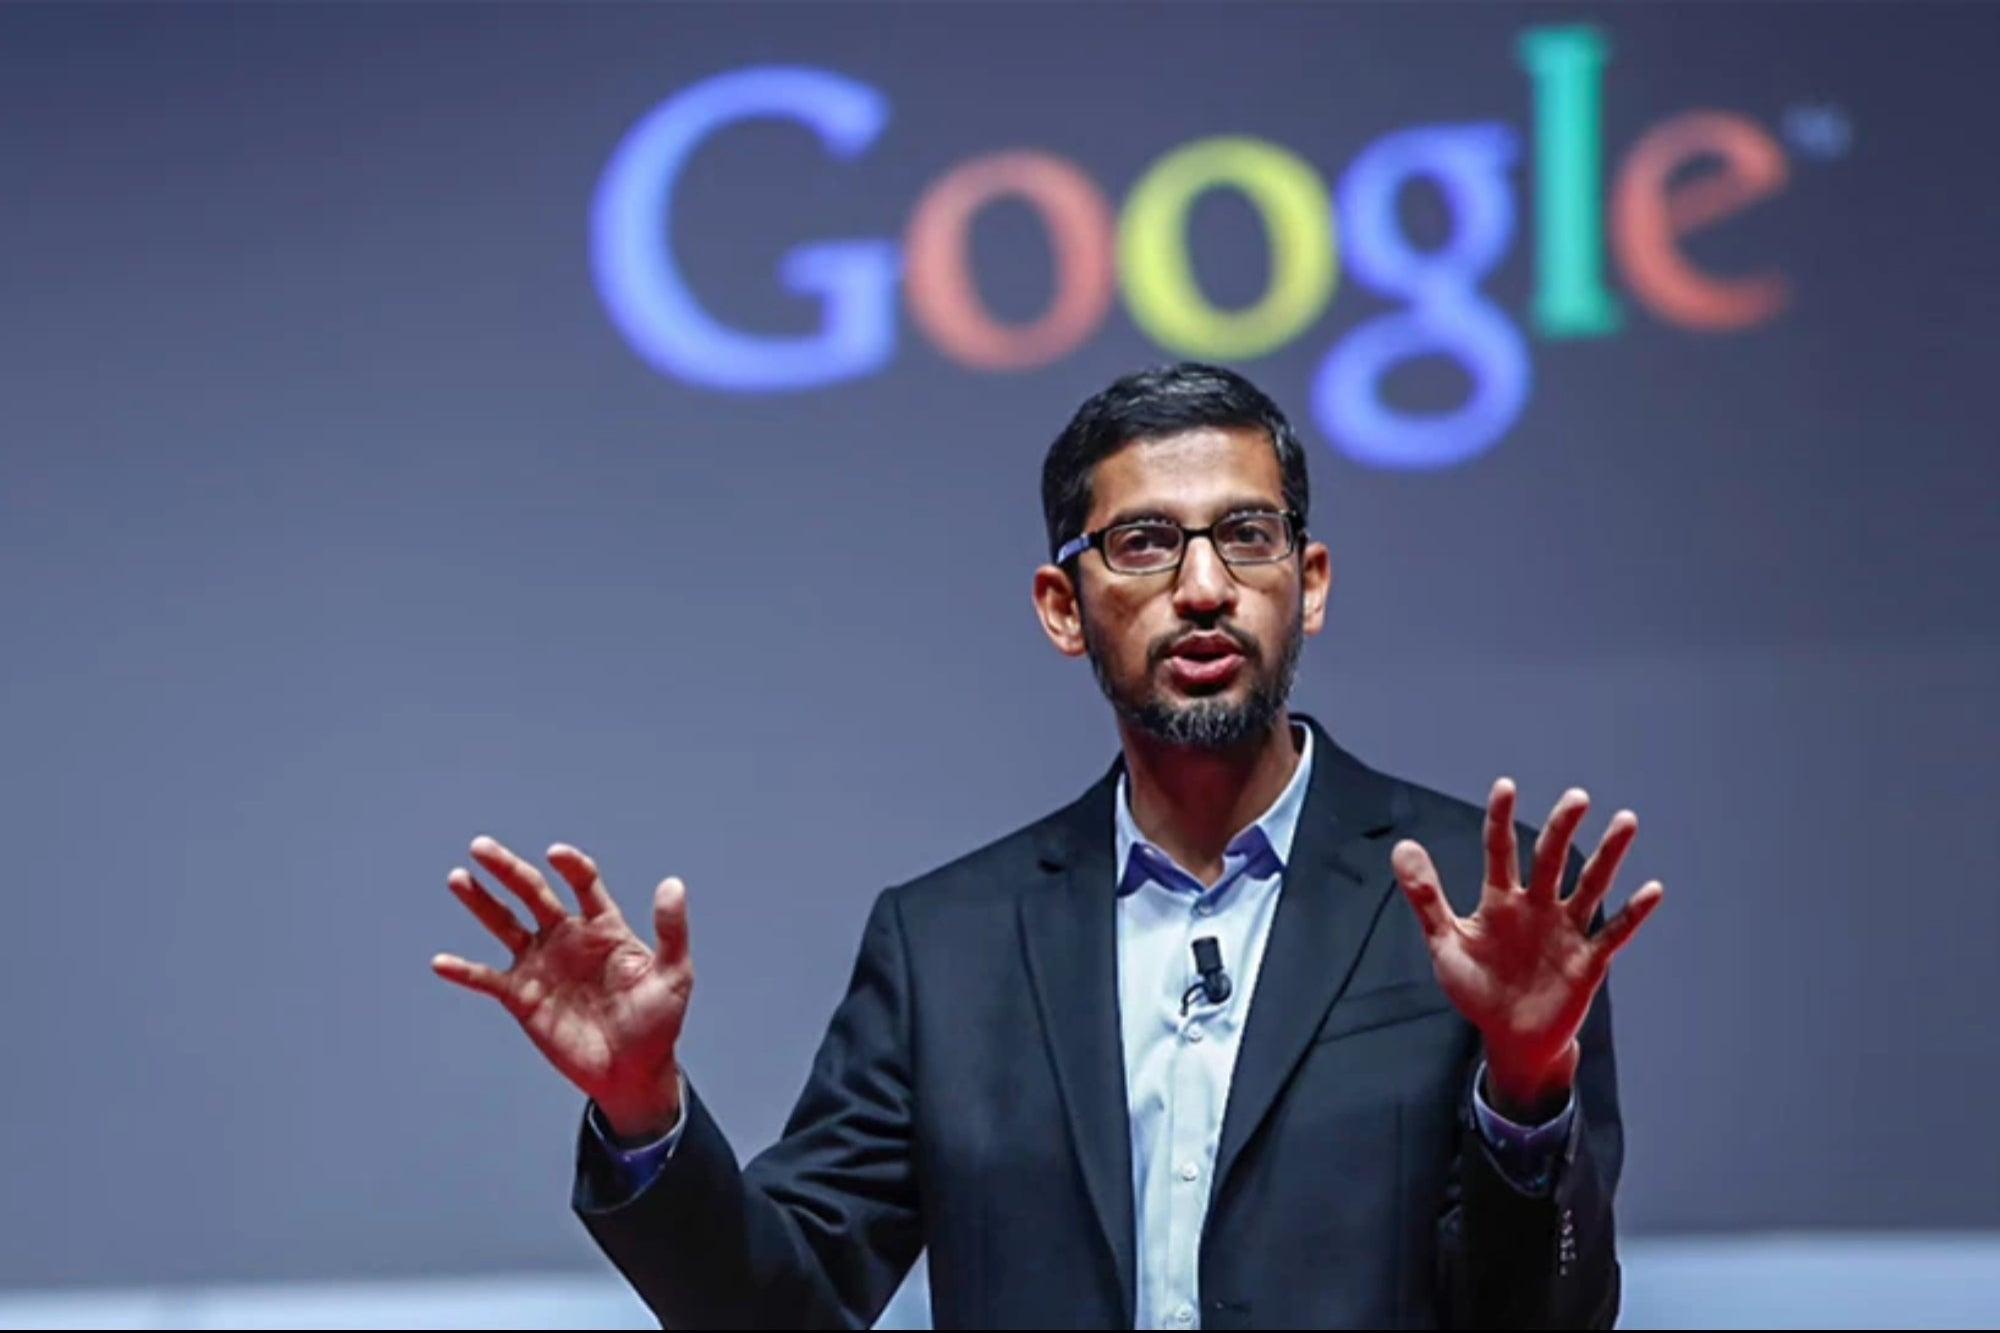 CEO Google, Sundar Pichai, tại một sự kiện hồi tháng 6. Ảnh: Google.